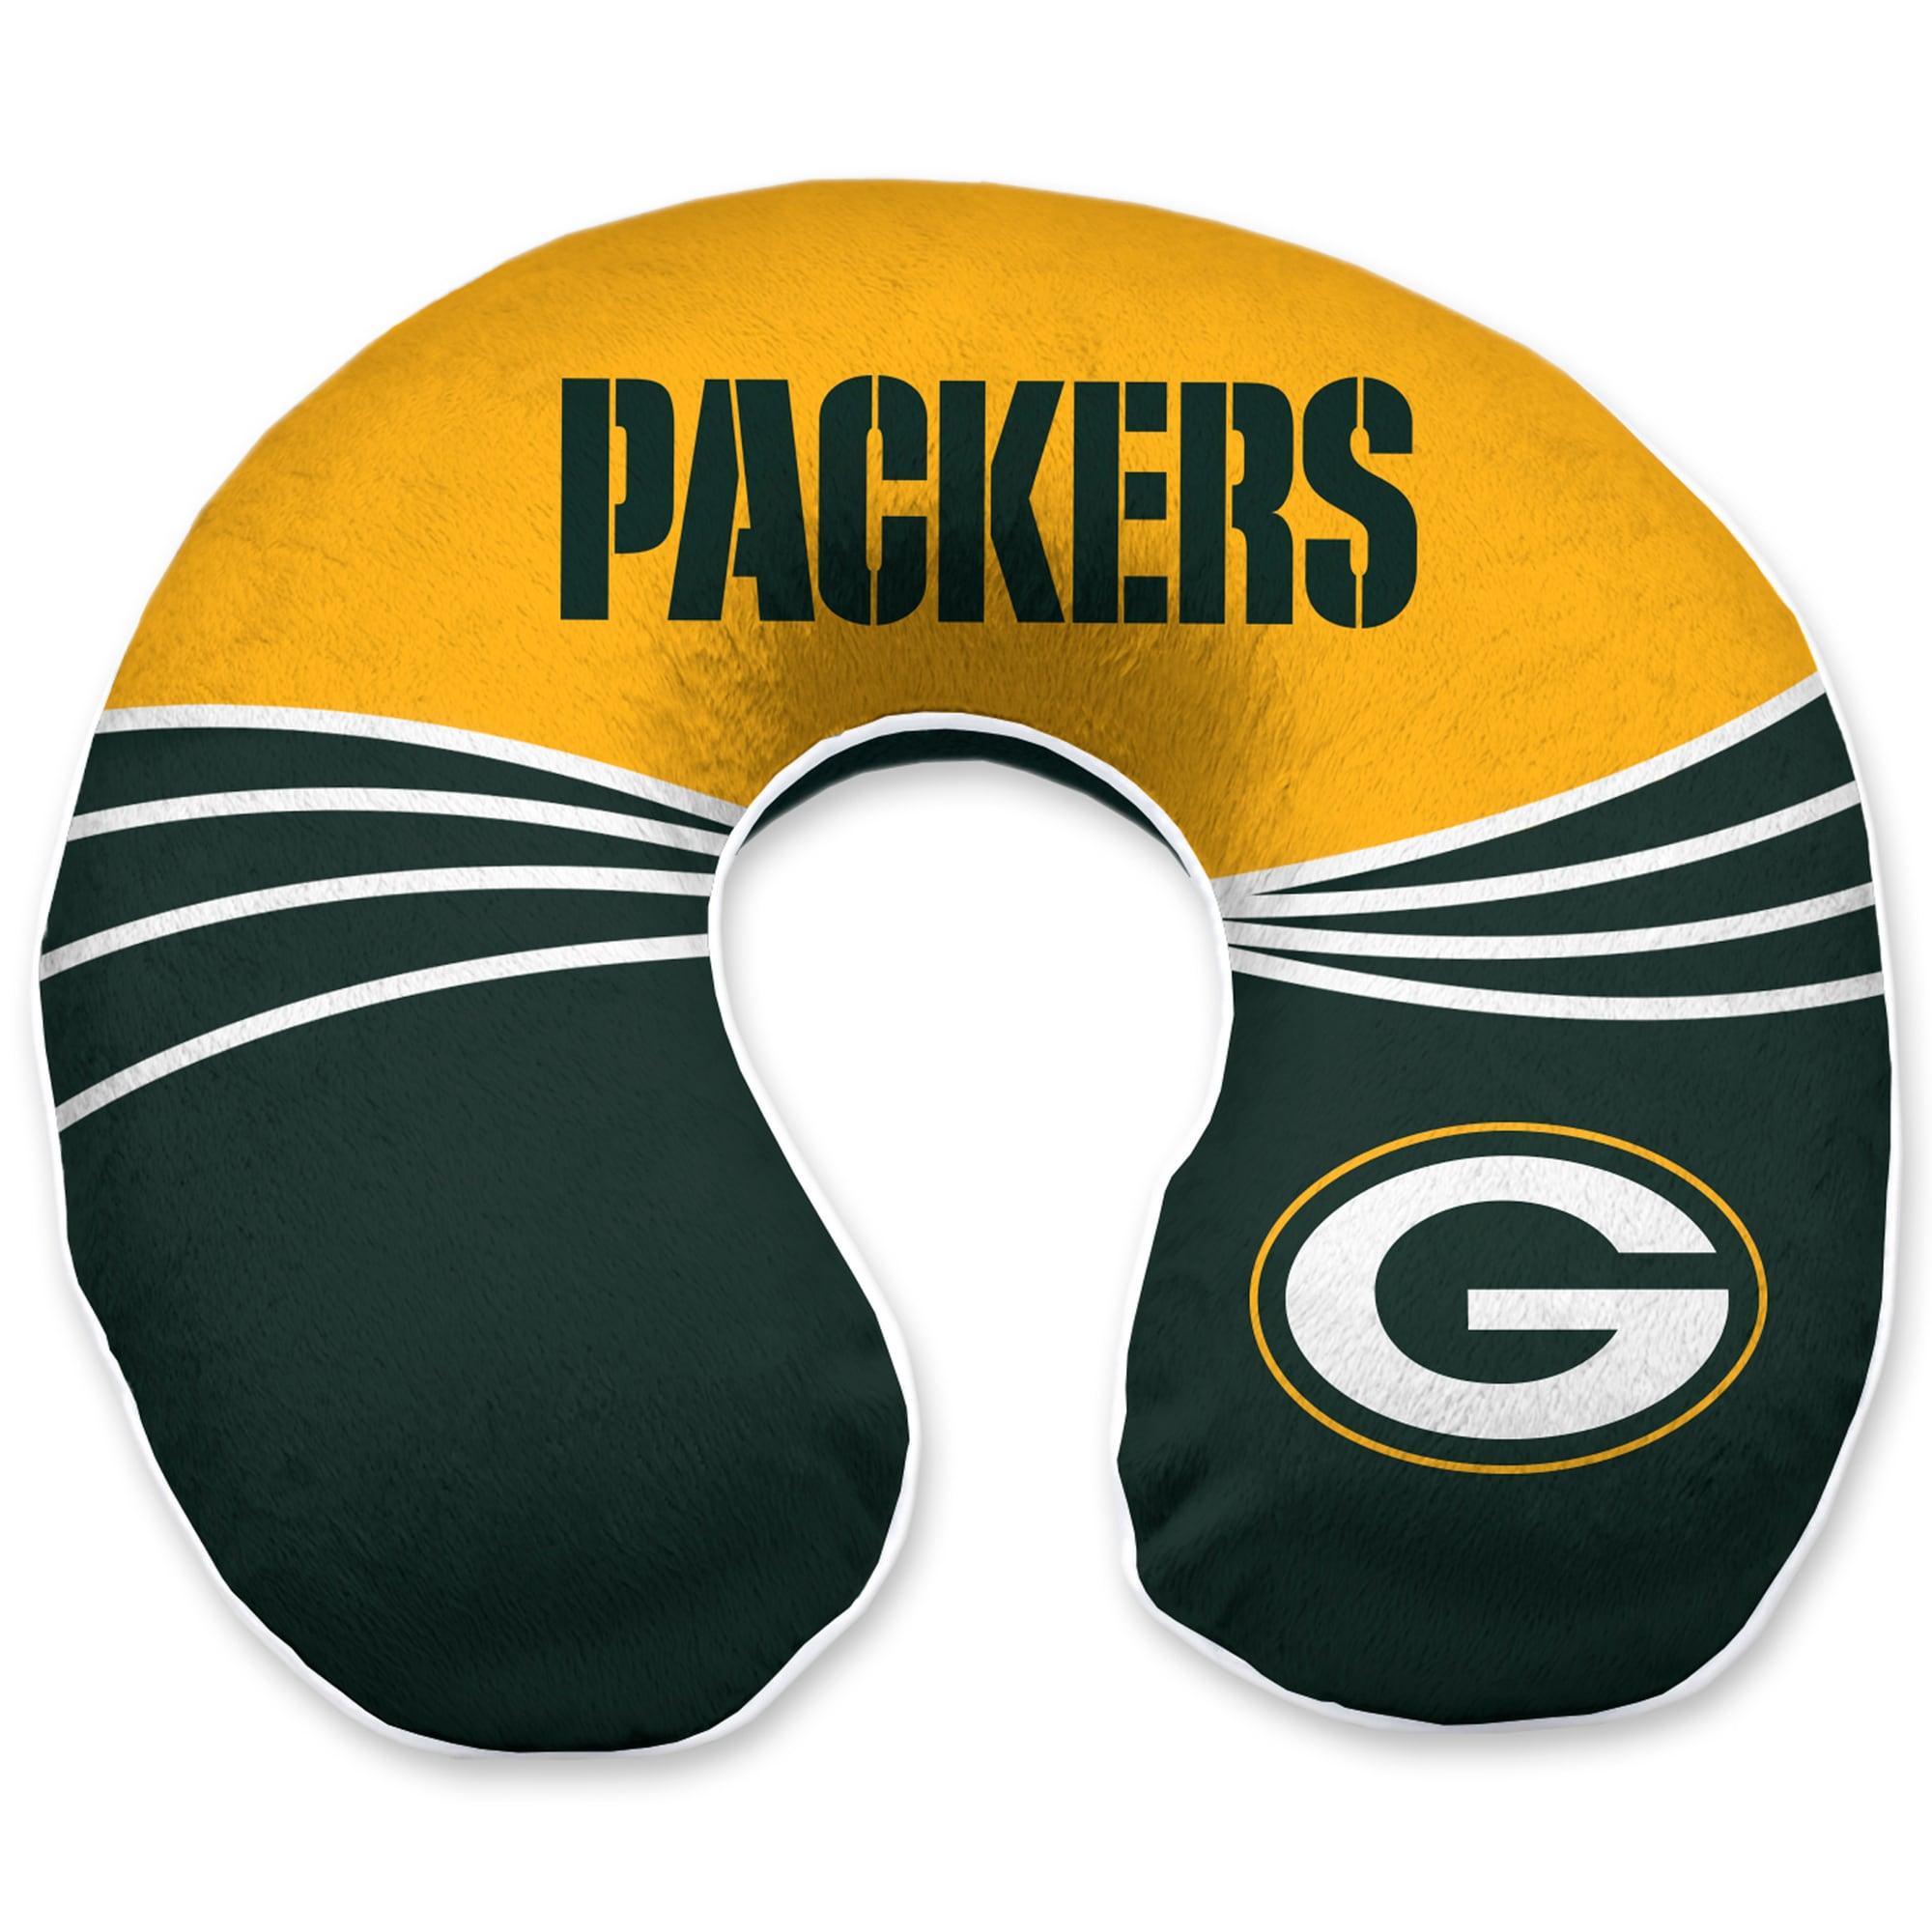 Green Bay Packers Wave Memory Foam U-Neck Travel Pillow - Green